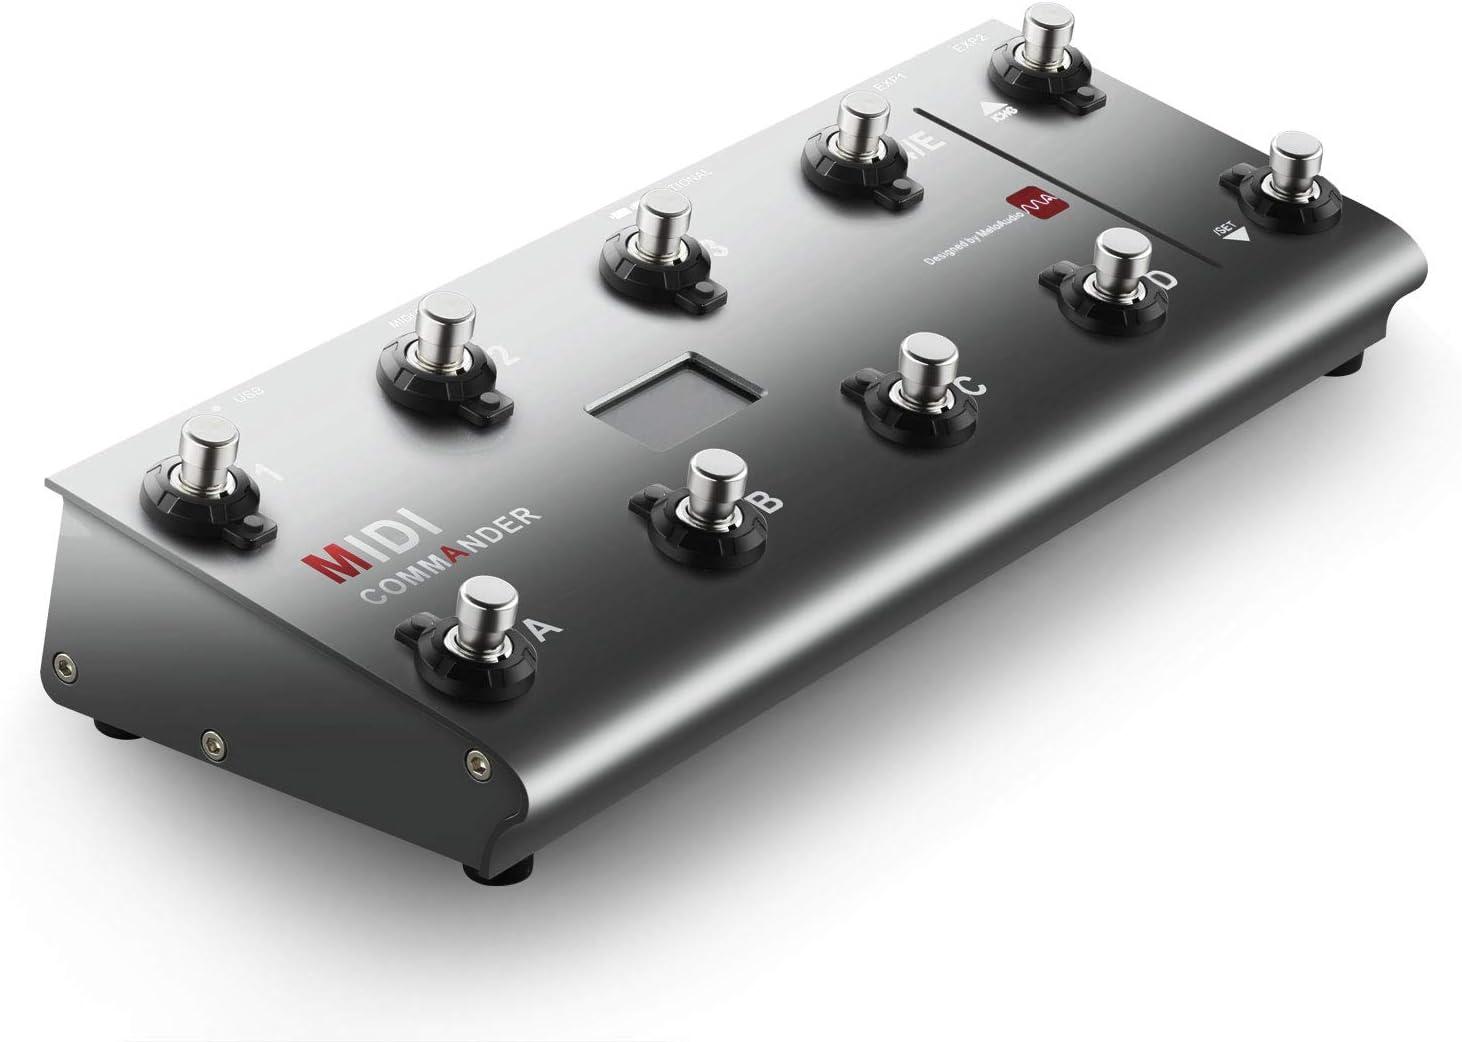 2. The MeloAudio MIDI Commander Foot Controller